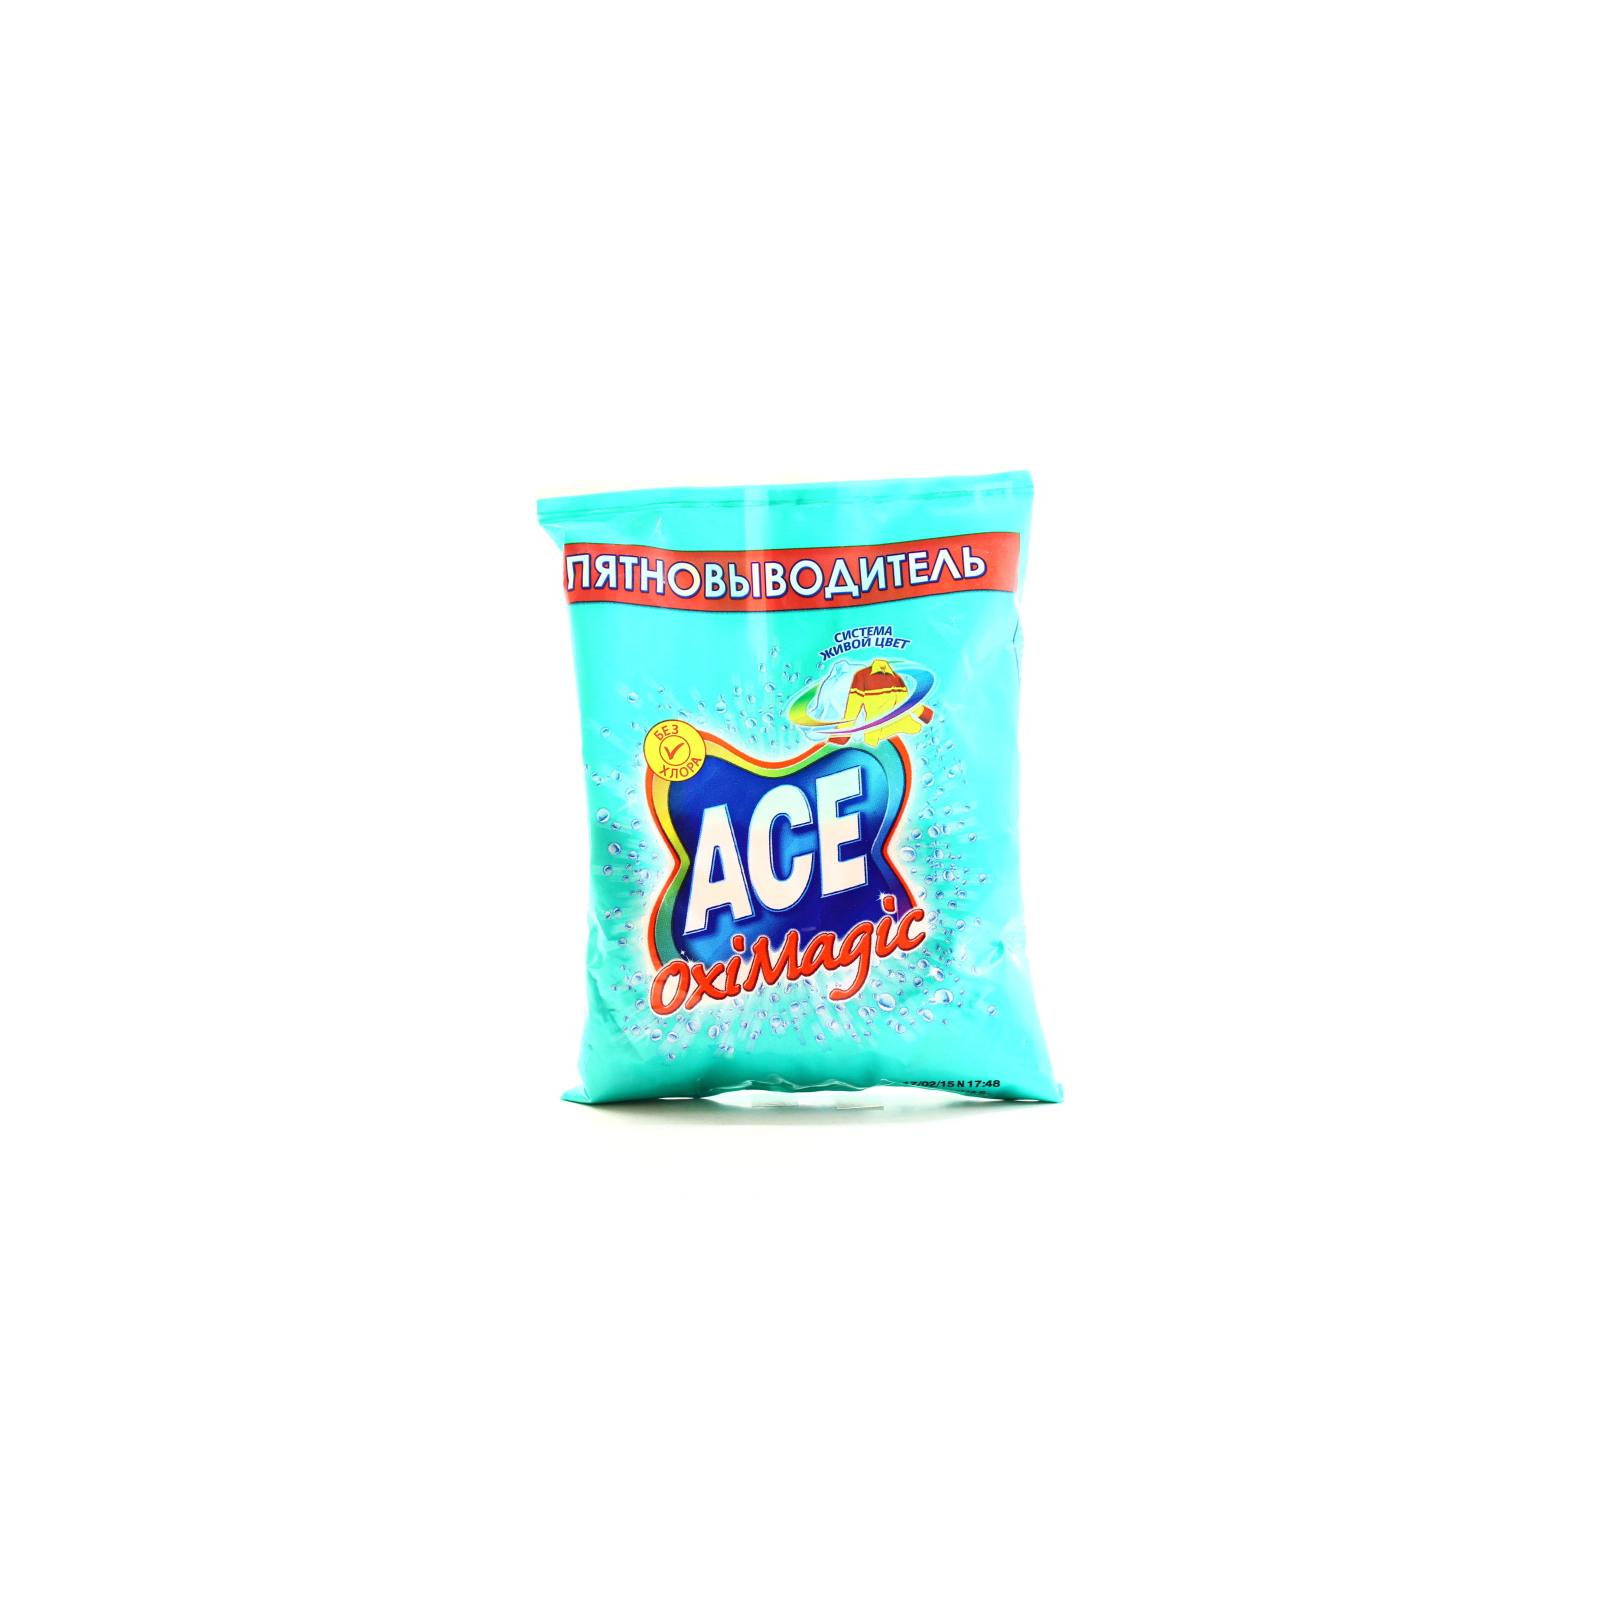 Средство для удаления пятен Ace Oxi Magic 200 г (8001480022546)